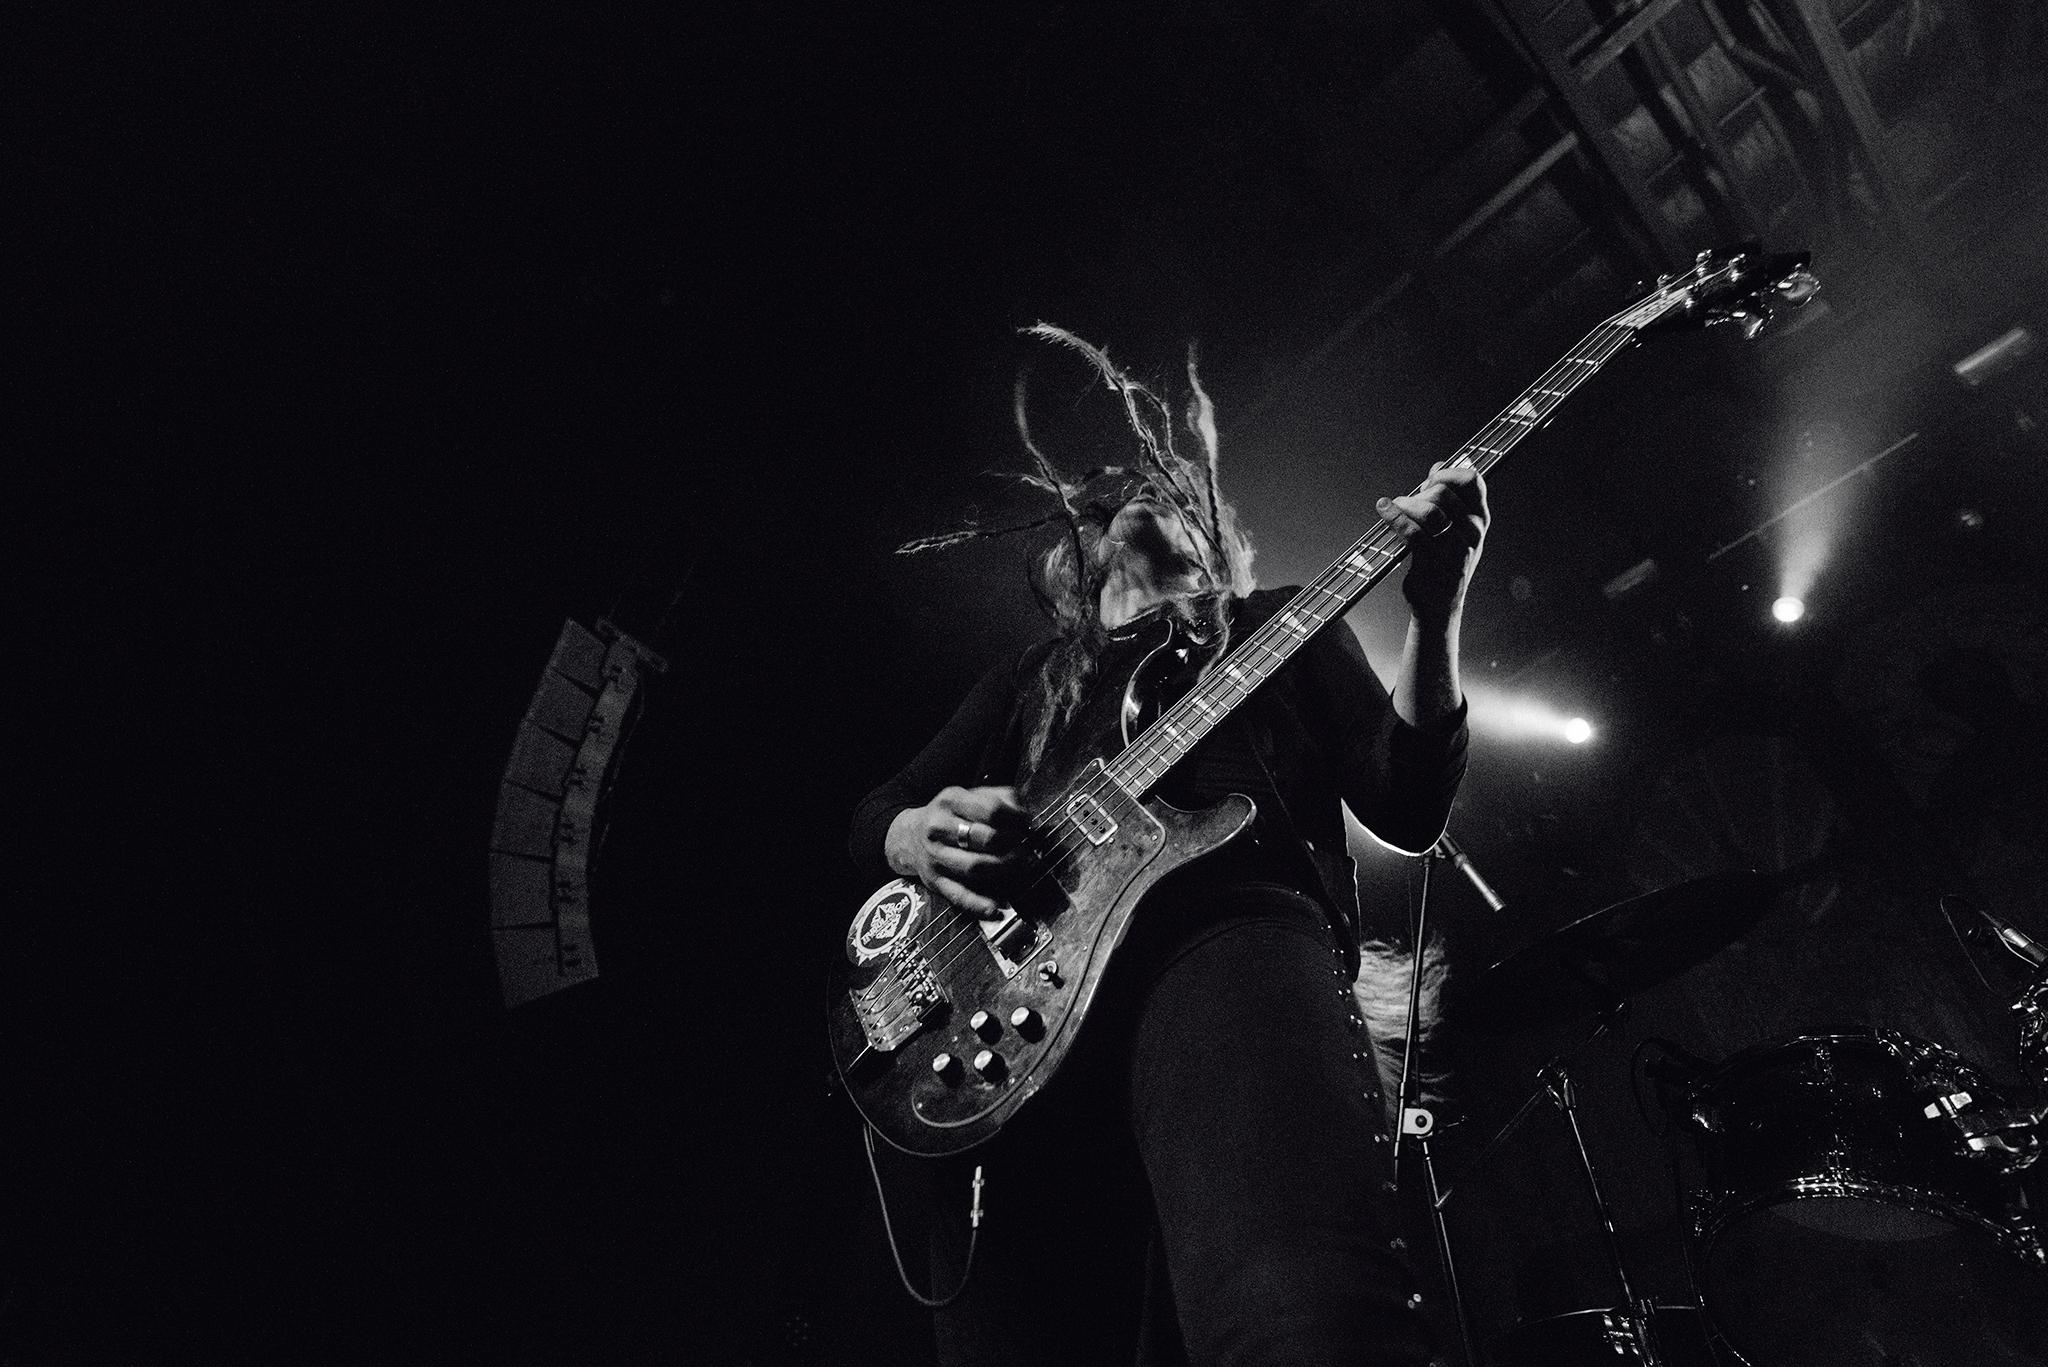 Tribulation-Emos-Concert-Photography-Katrina-Barber-5.jpg